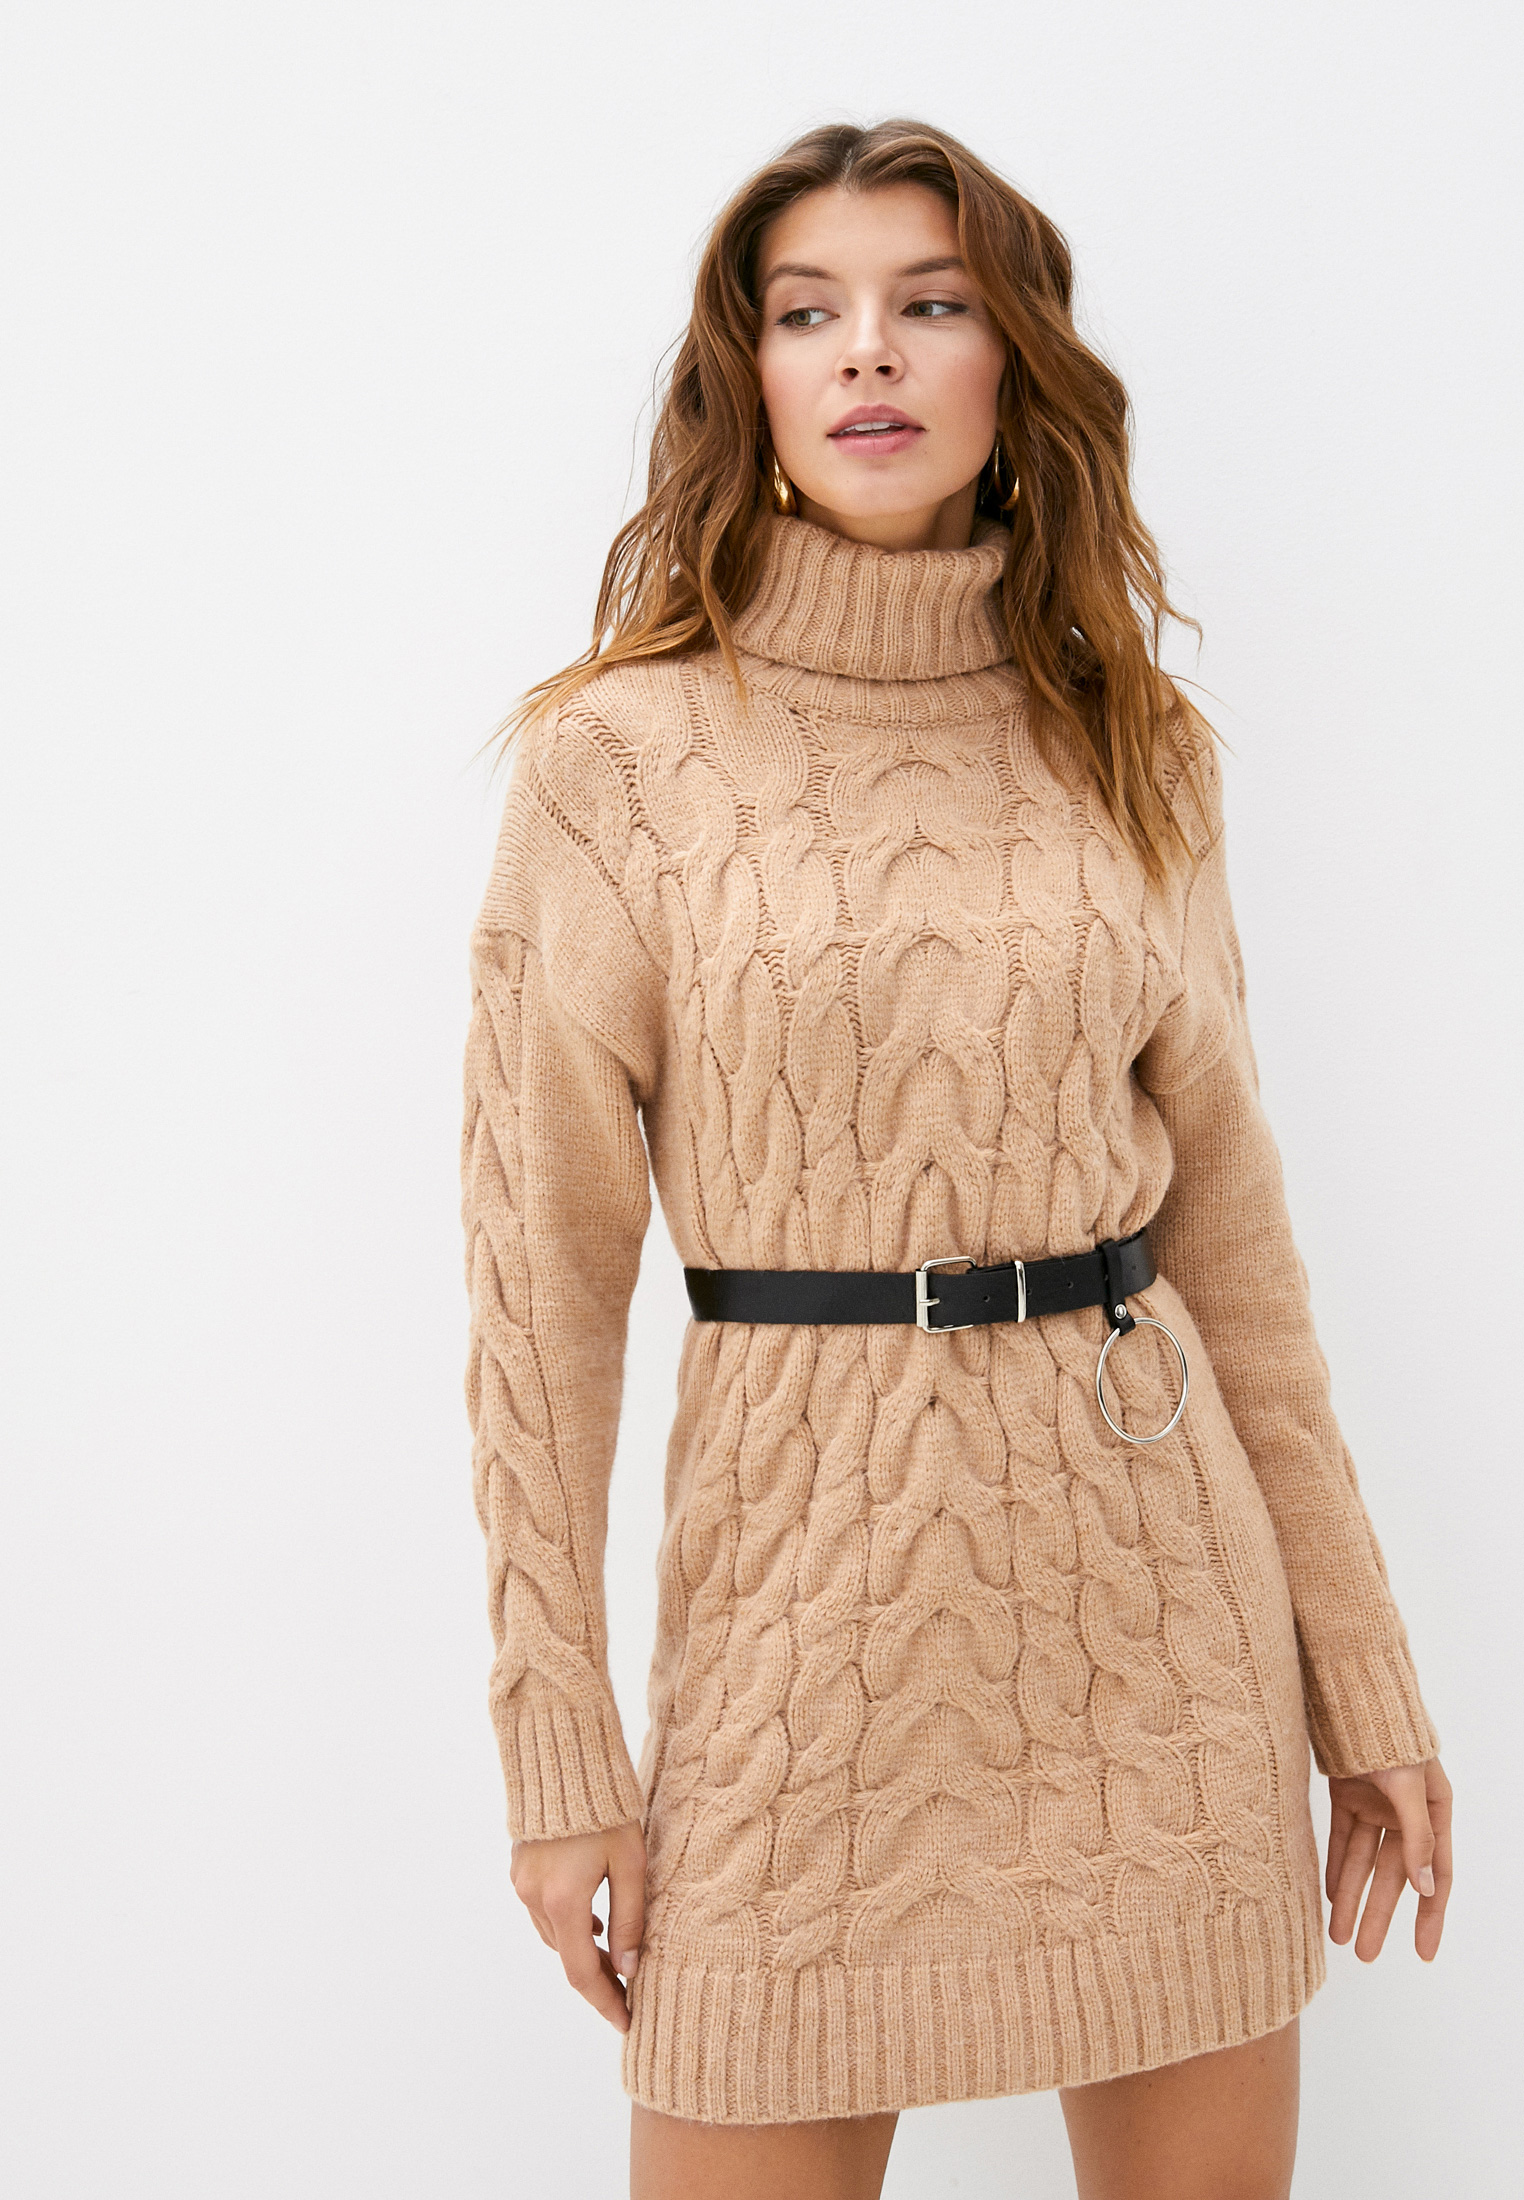 Вязаное платье Vickwool WV271-2